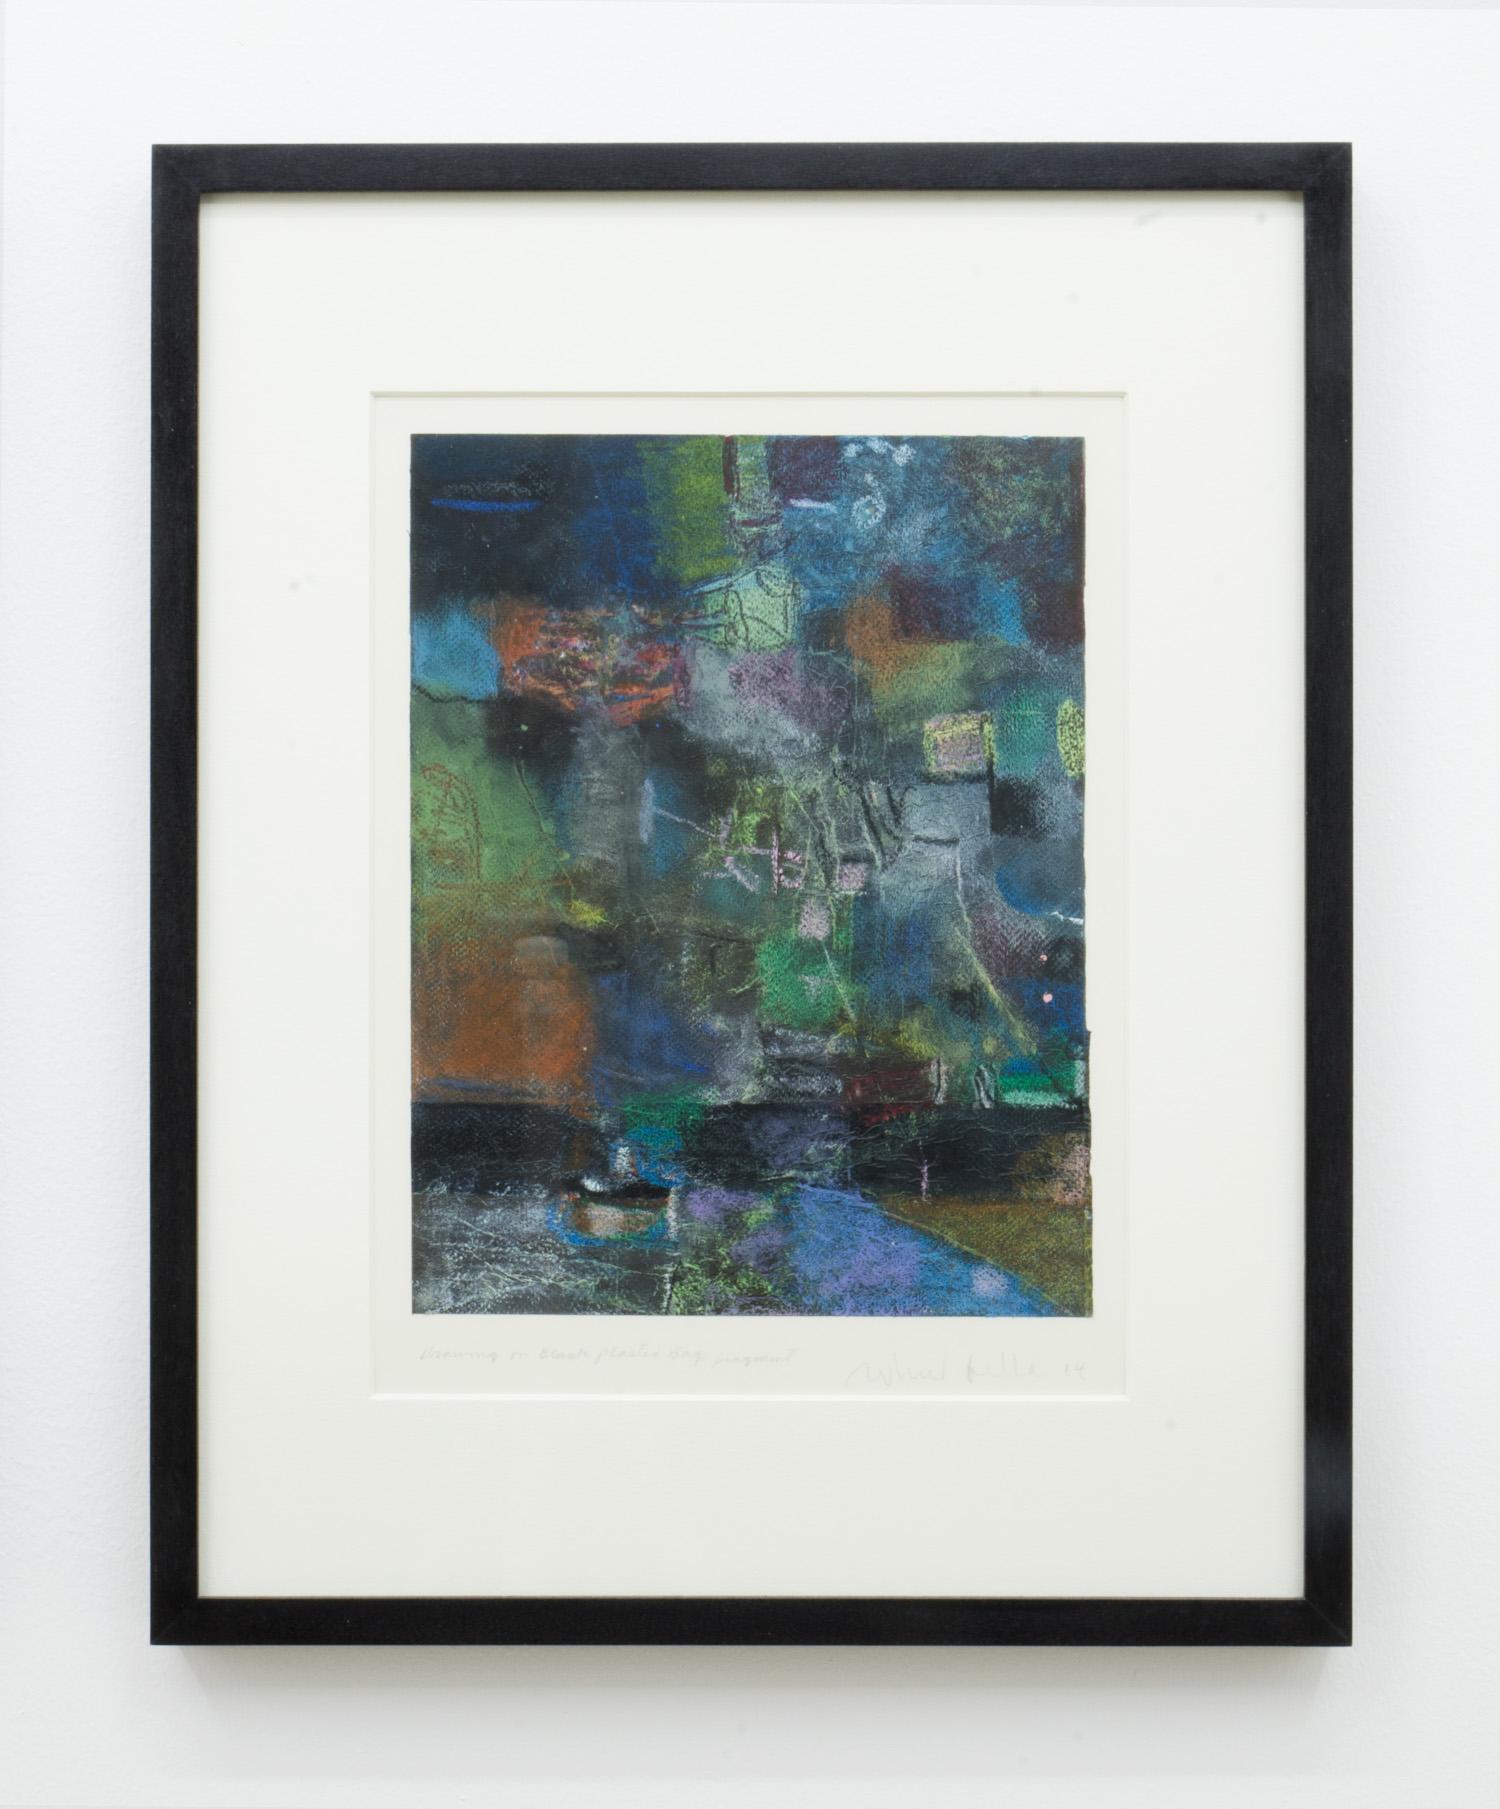 Ed Fella, Untitled, 2014, oil pastel on plastic bag, 38.8 x 31 cm (Framed).